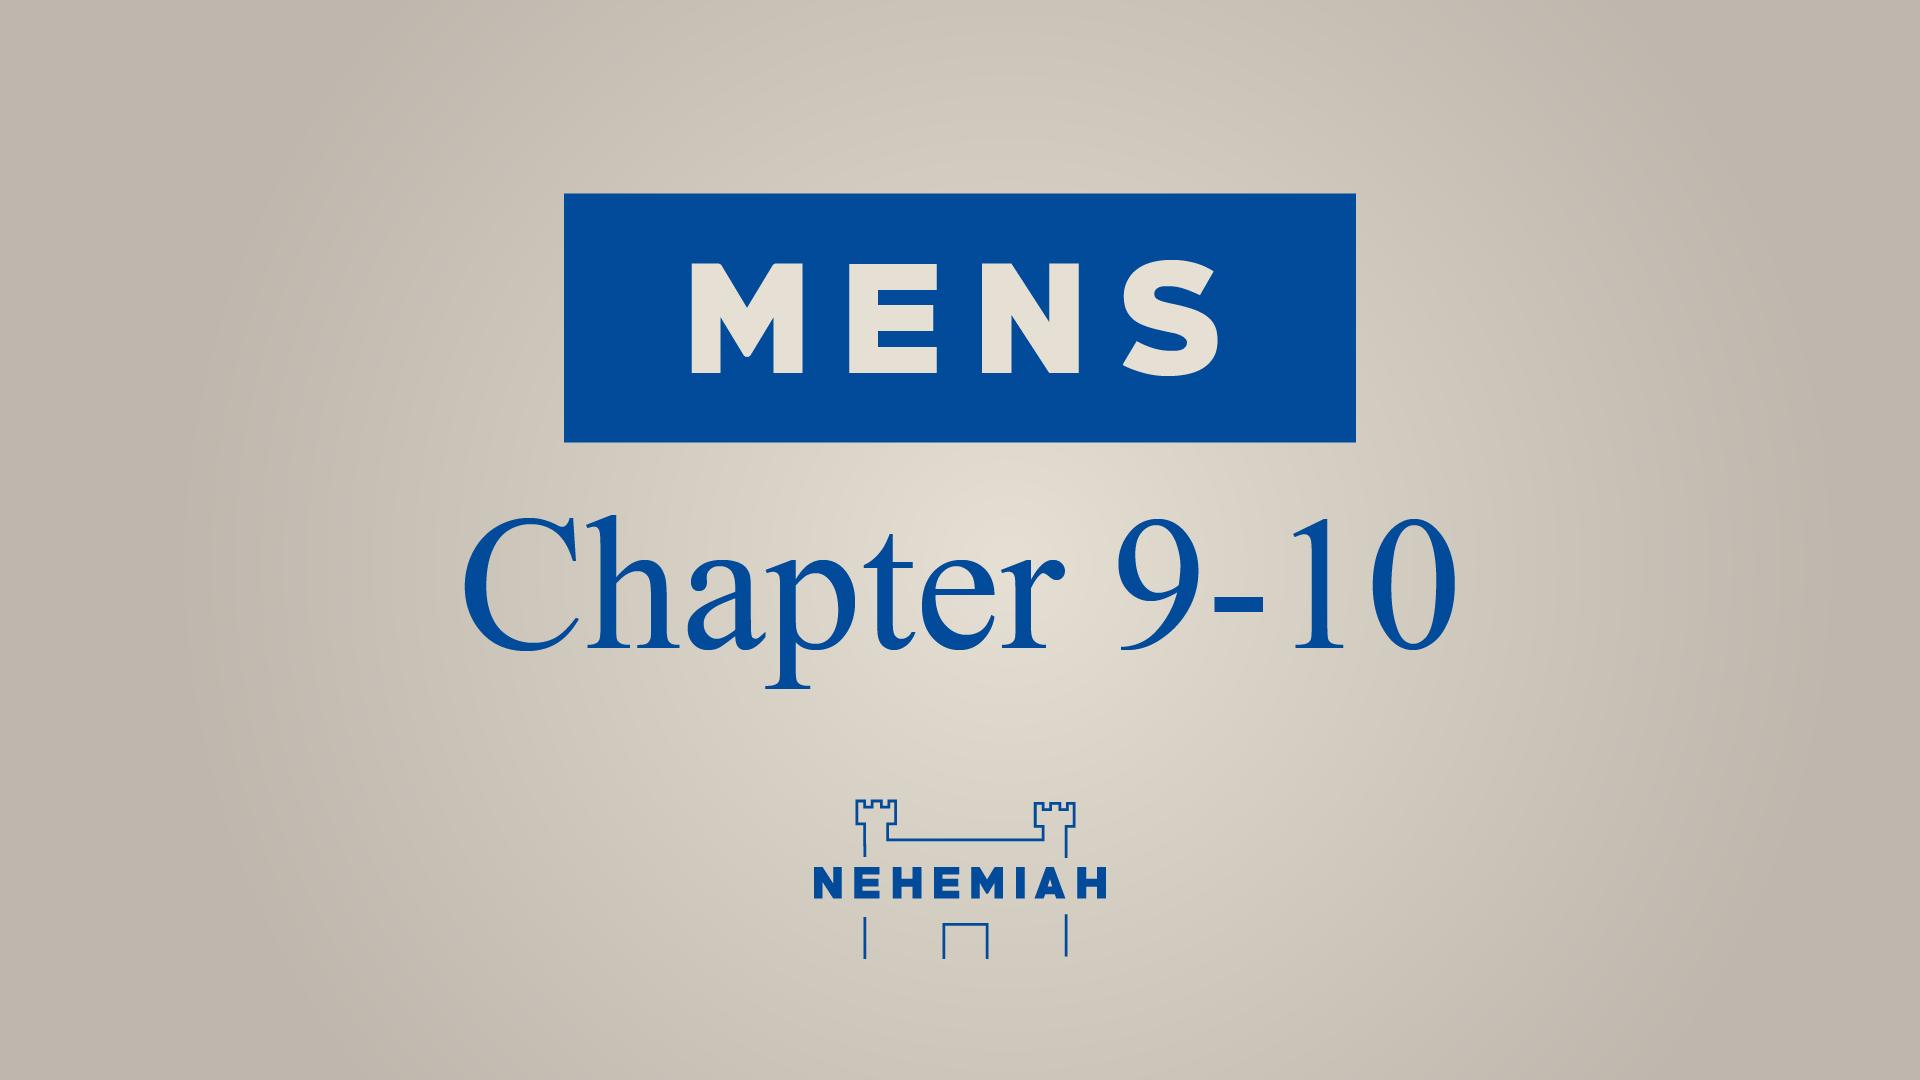 Nehemiah-BS_Men-9-10.png